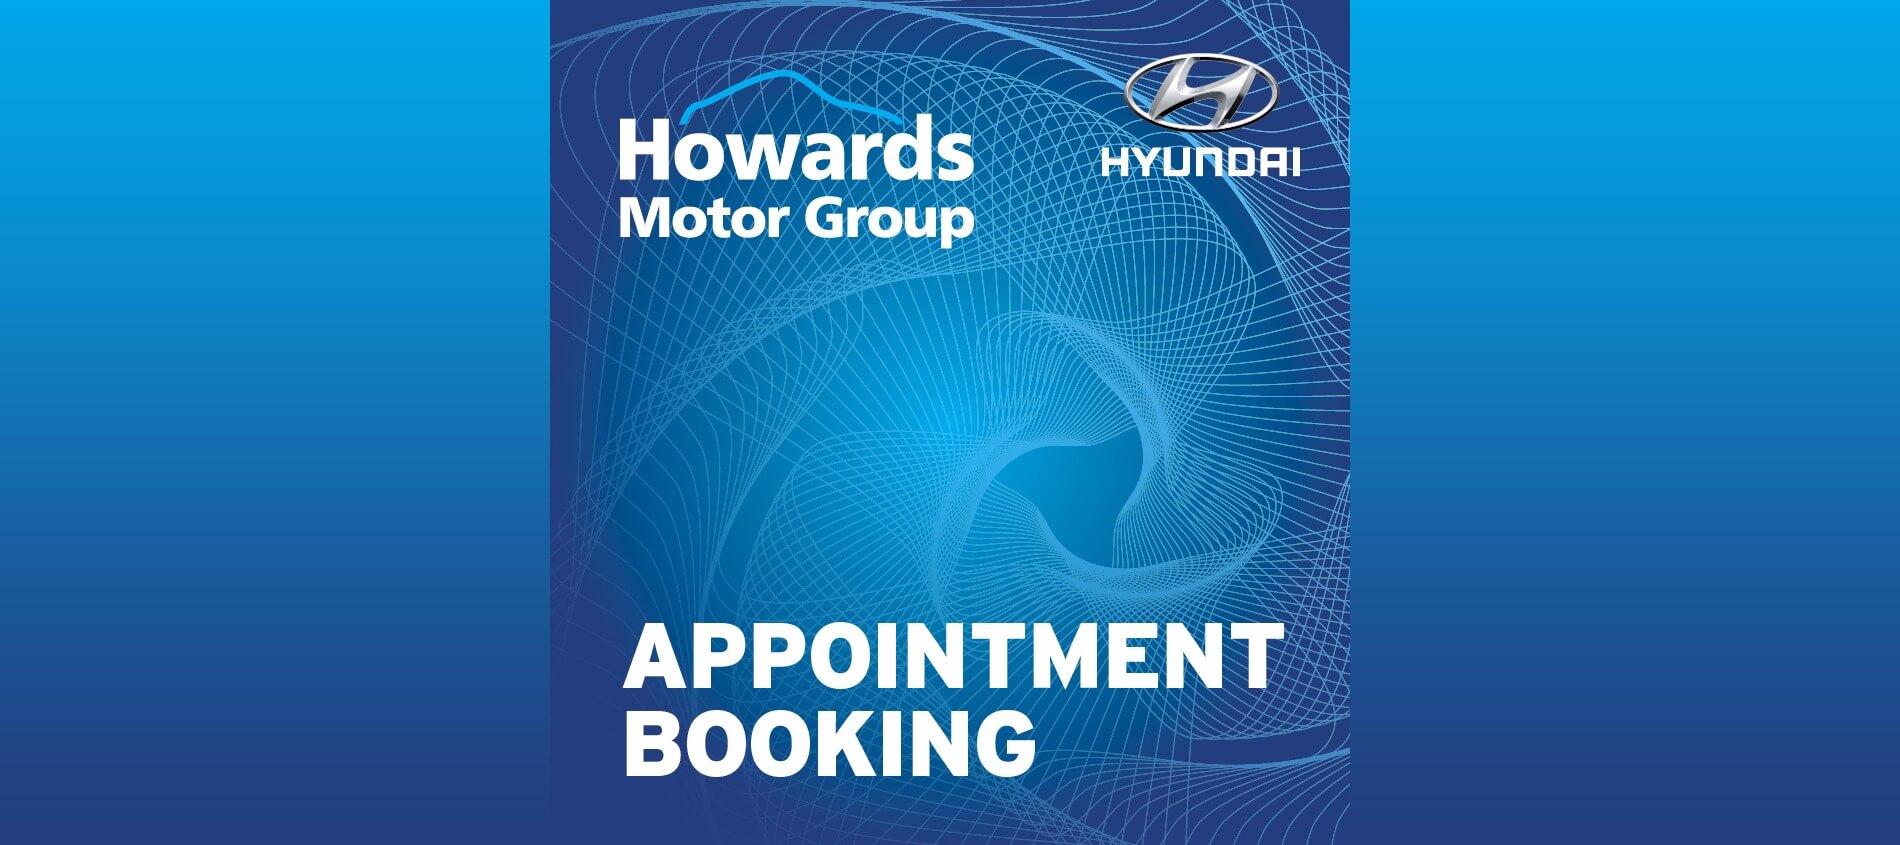 hyundai-apt-booking